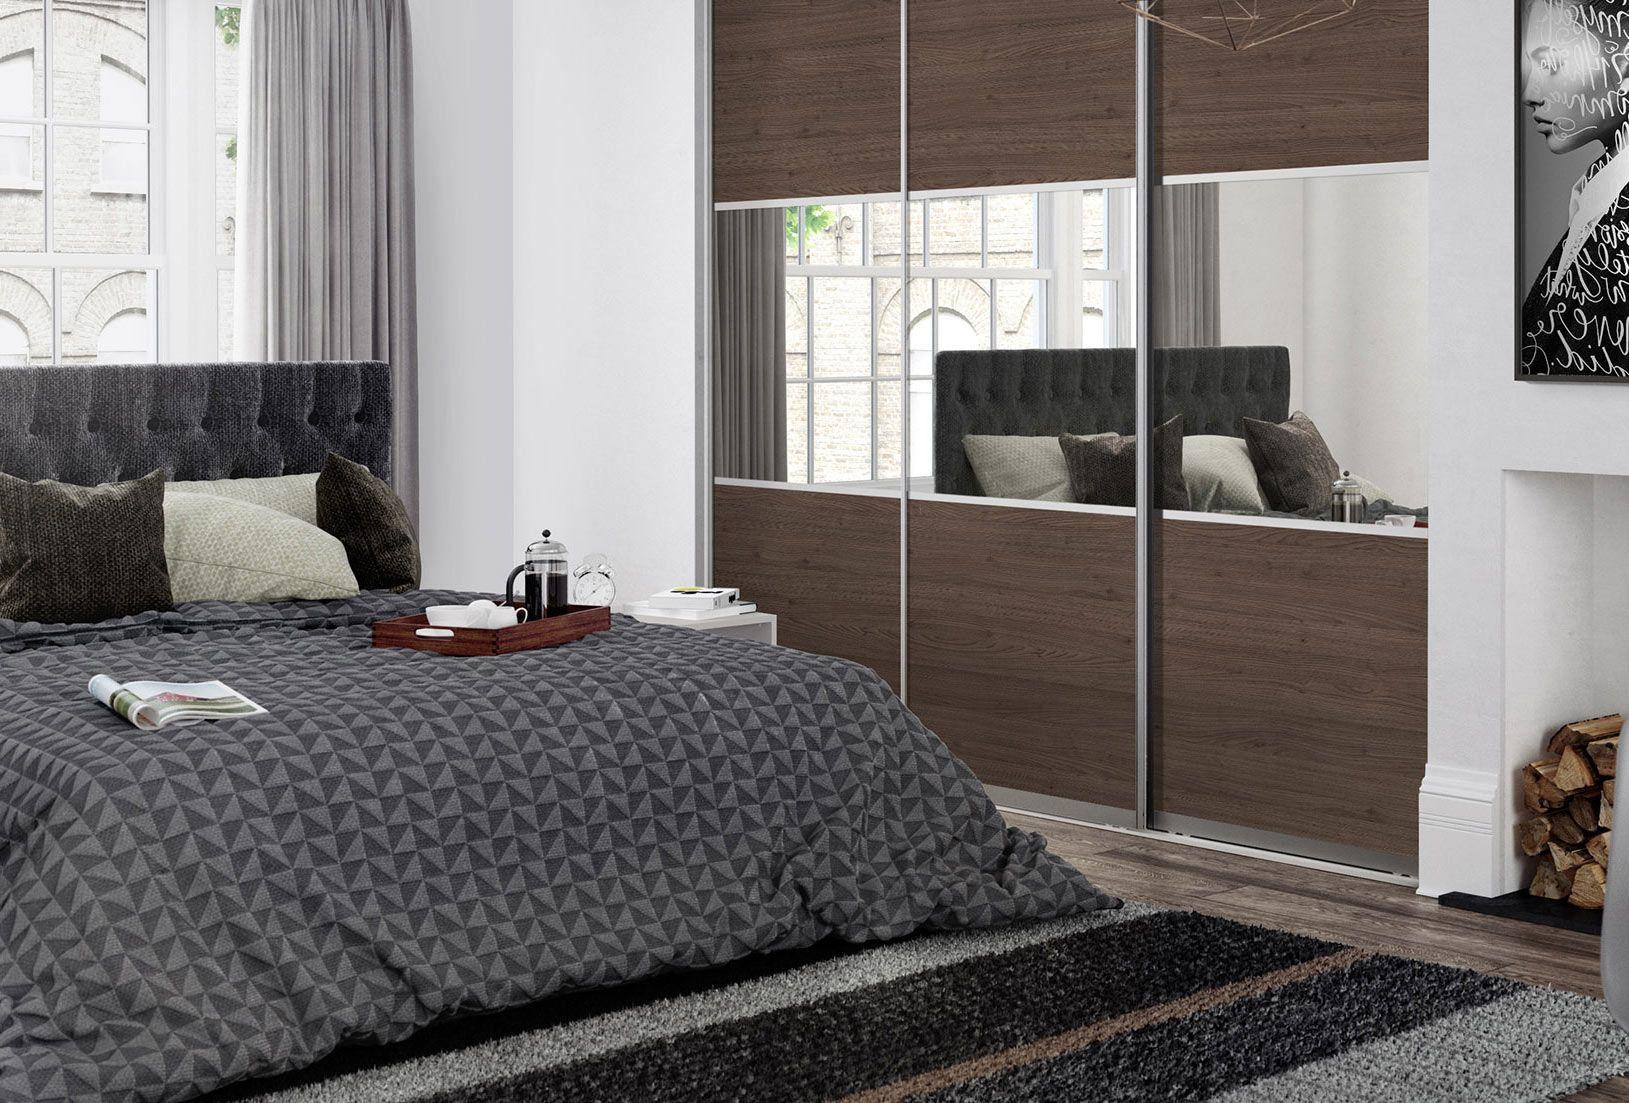 3 panel mirrored sliding closet doors - Sliding Wardrobe Doors Premium Midi 3 Panel Tortona Chestnut Mirror Doors With Satin Silver Frame